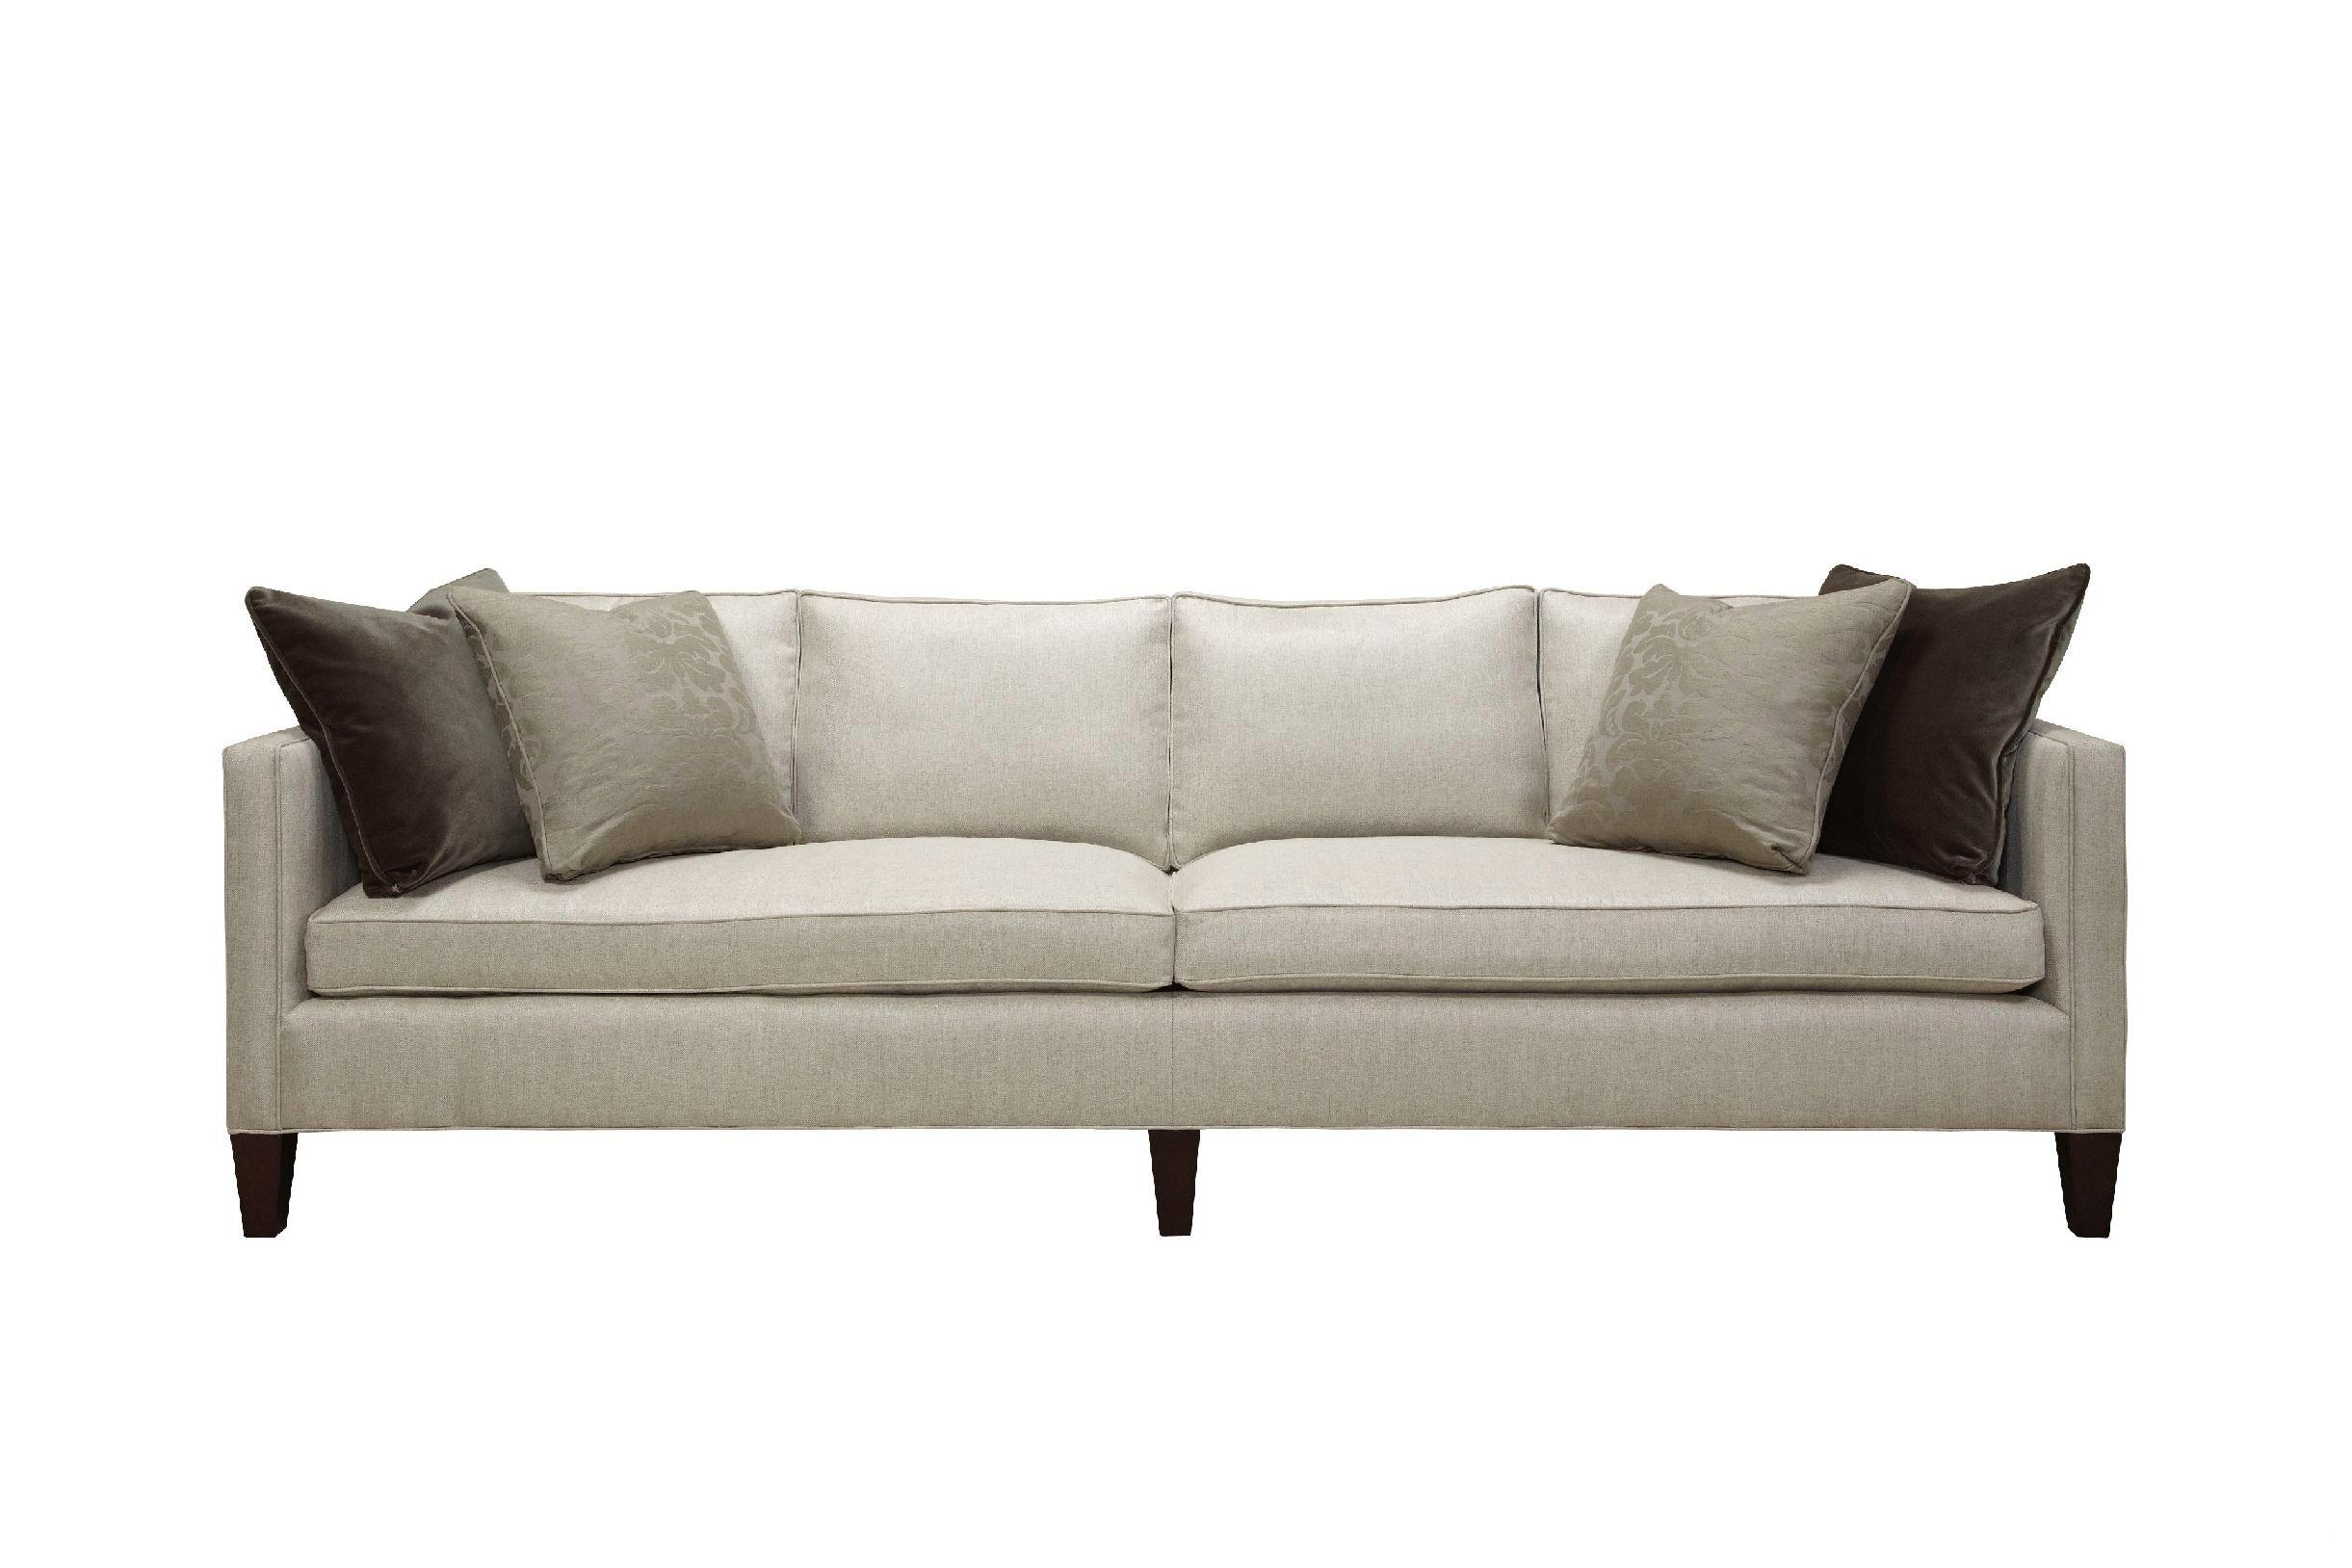 Southern Furniture Living Room Harrison Sofa 22051 Gorman S